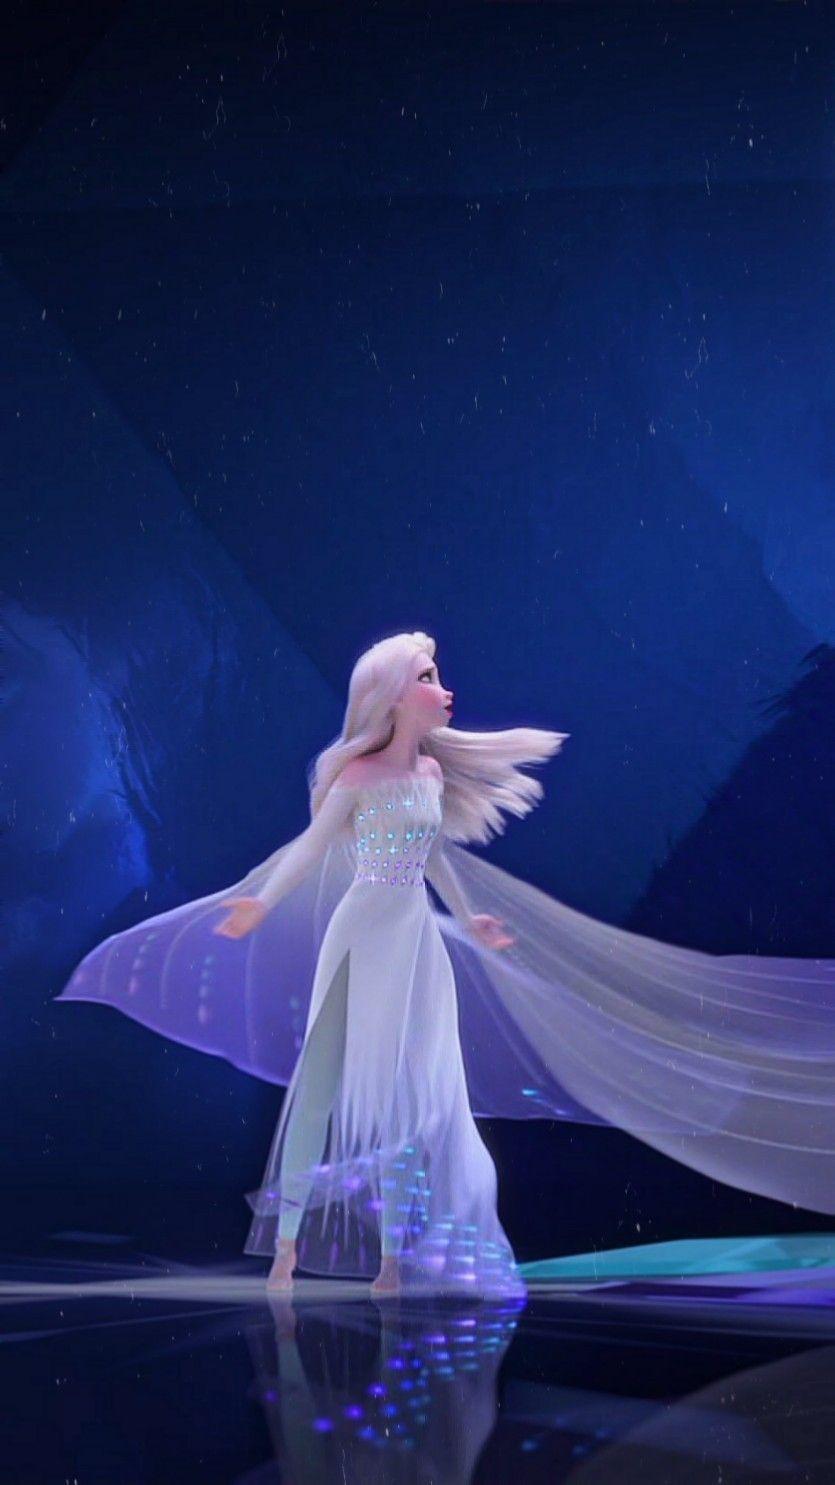 Show Yourself In 2020 Disney Frozen Elsa Art Disney Princess Drawings Disney Princess Wallpaper